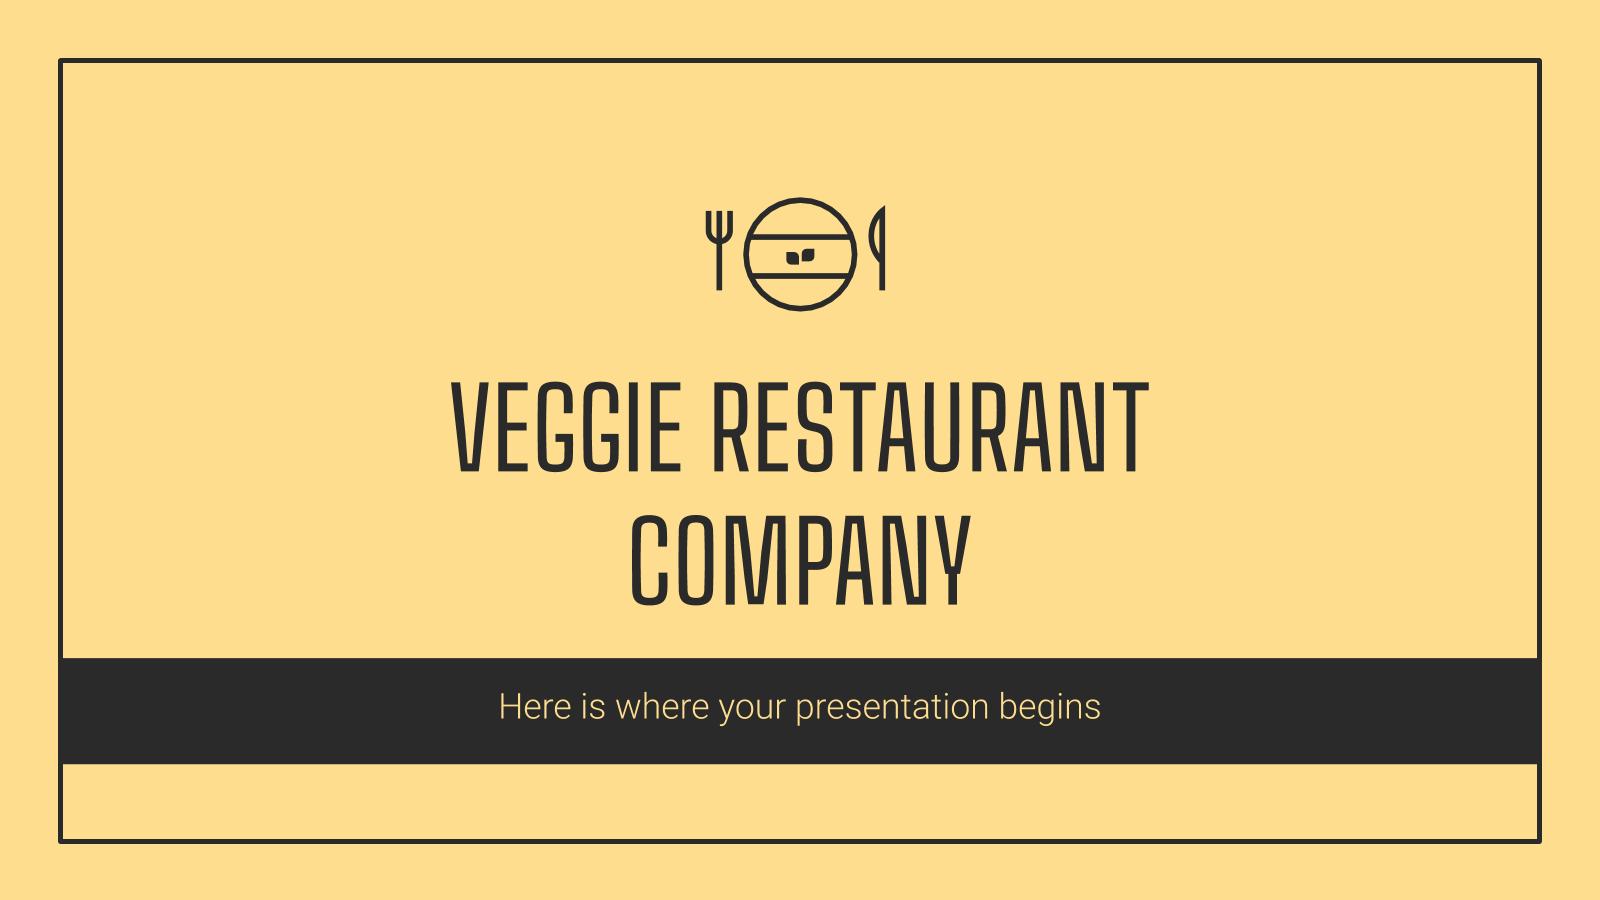 Veggie Restaurant Company Profile presentation template